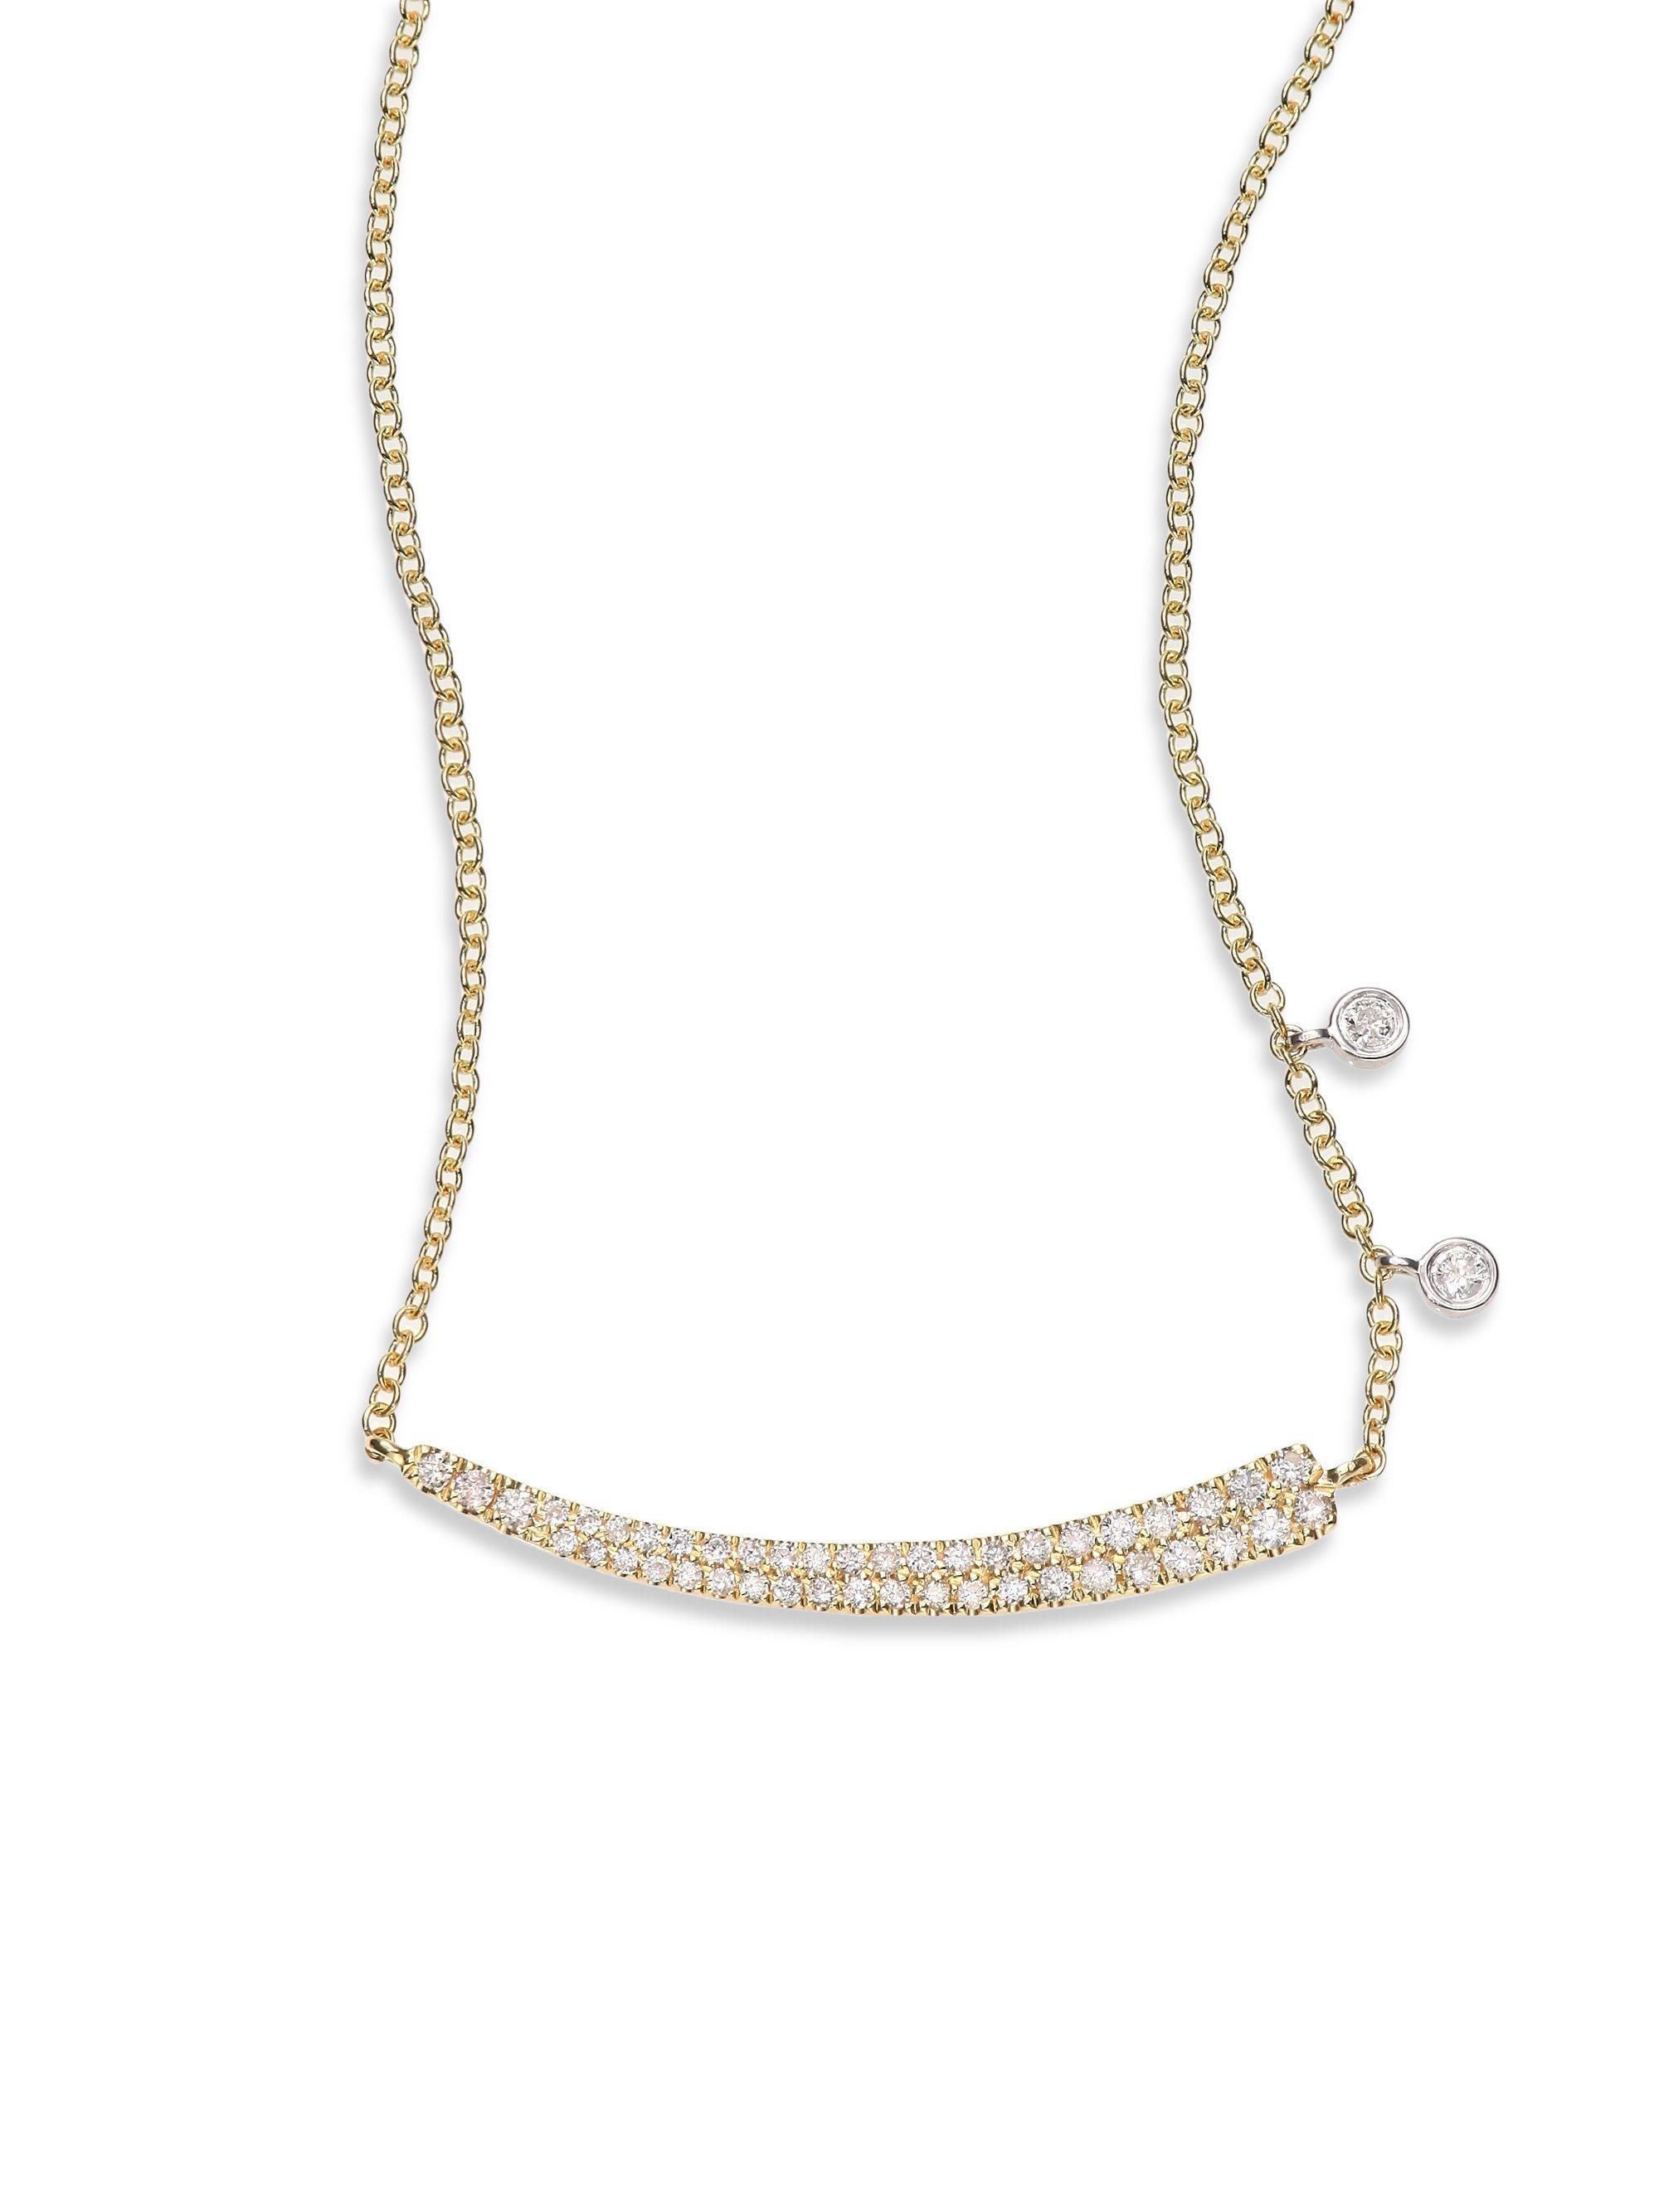 fearlessness original ferrari mero traumspuren necklace galery